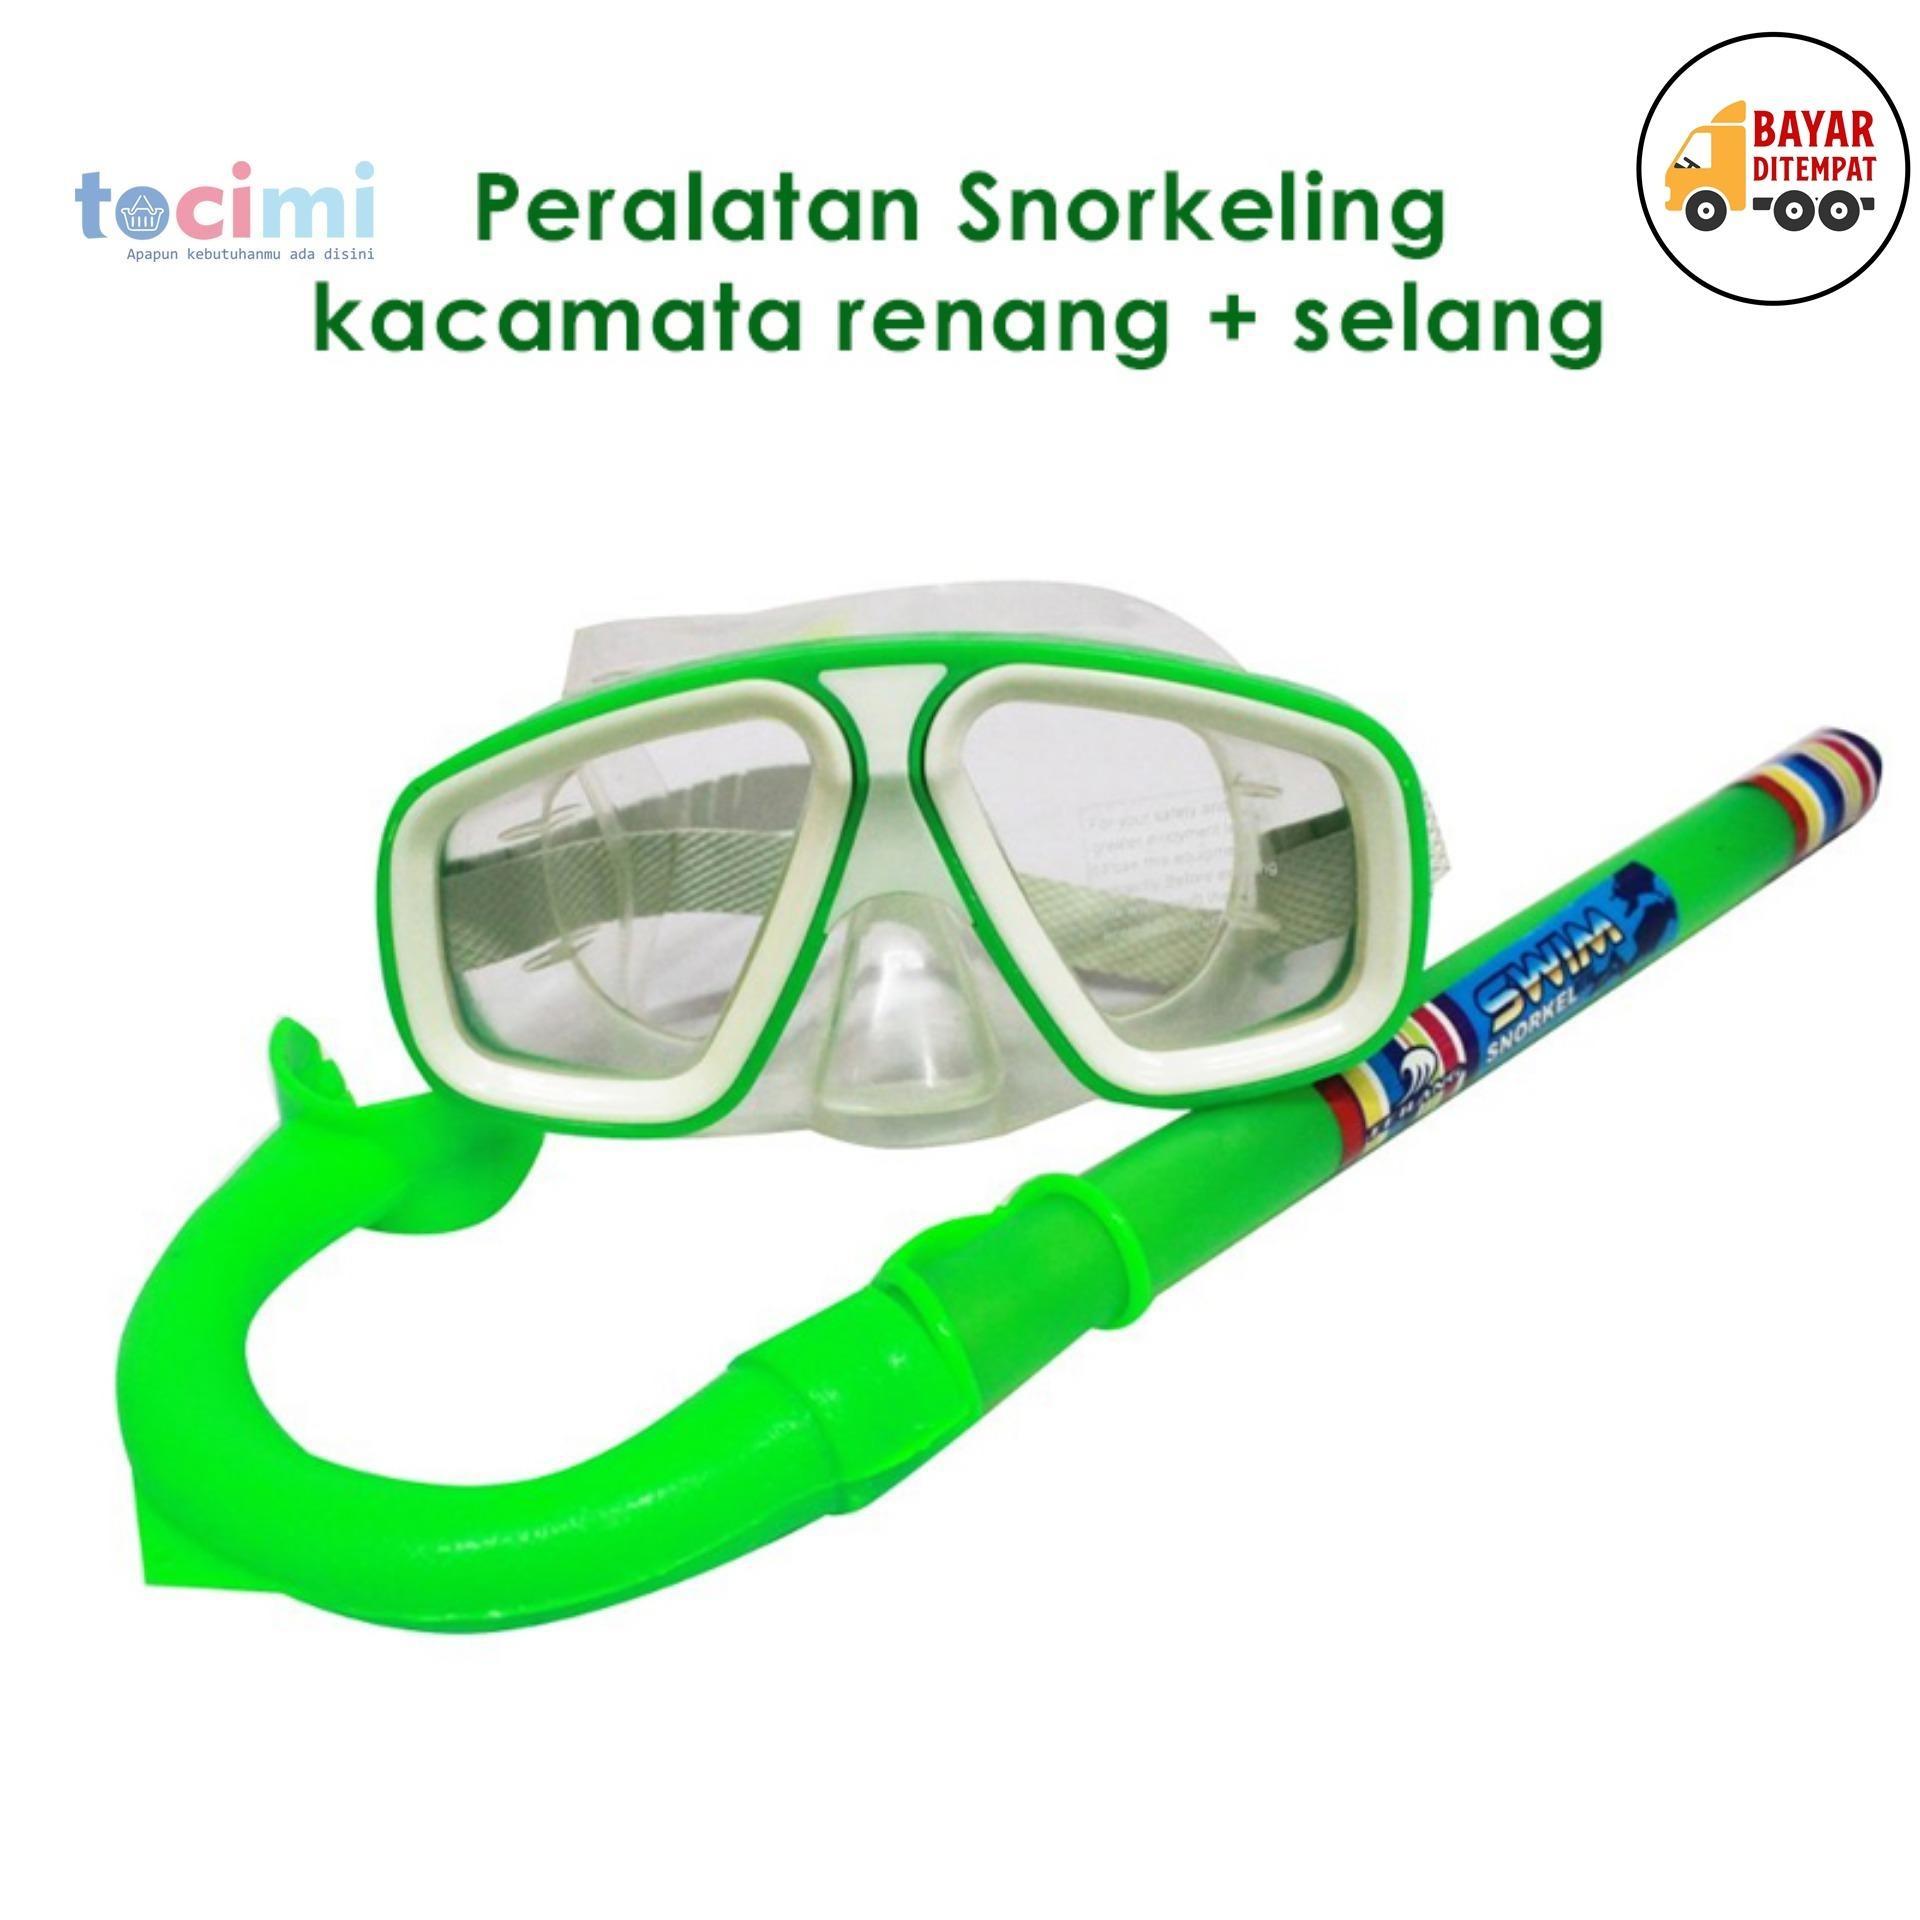 Tocimi - Alat Snorkling Peralatan Snorkeling - Kacamata Renang + Selang Anak ( Alat Selam, Set Snorkeling, Snorkel ) - Warna Random By Tocimi.